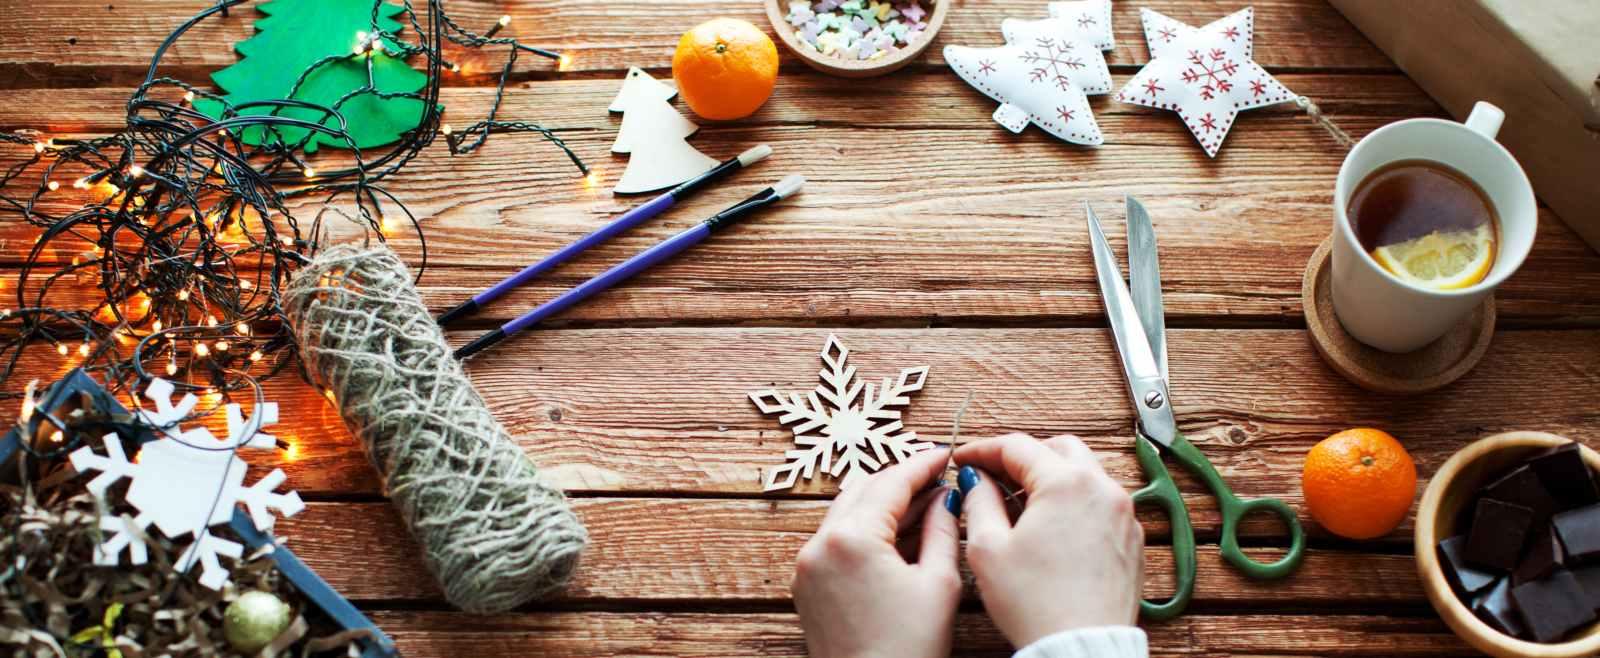 DIY décorations Noël